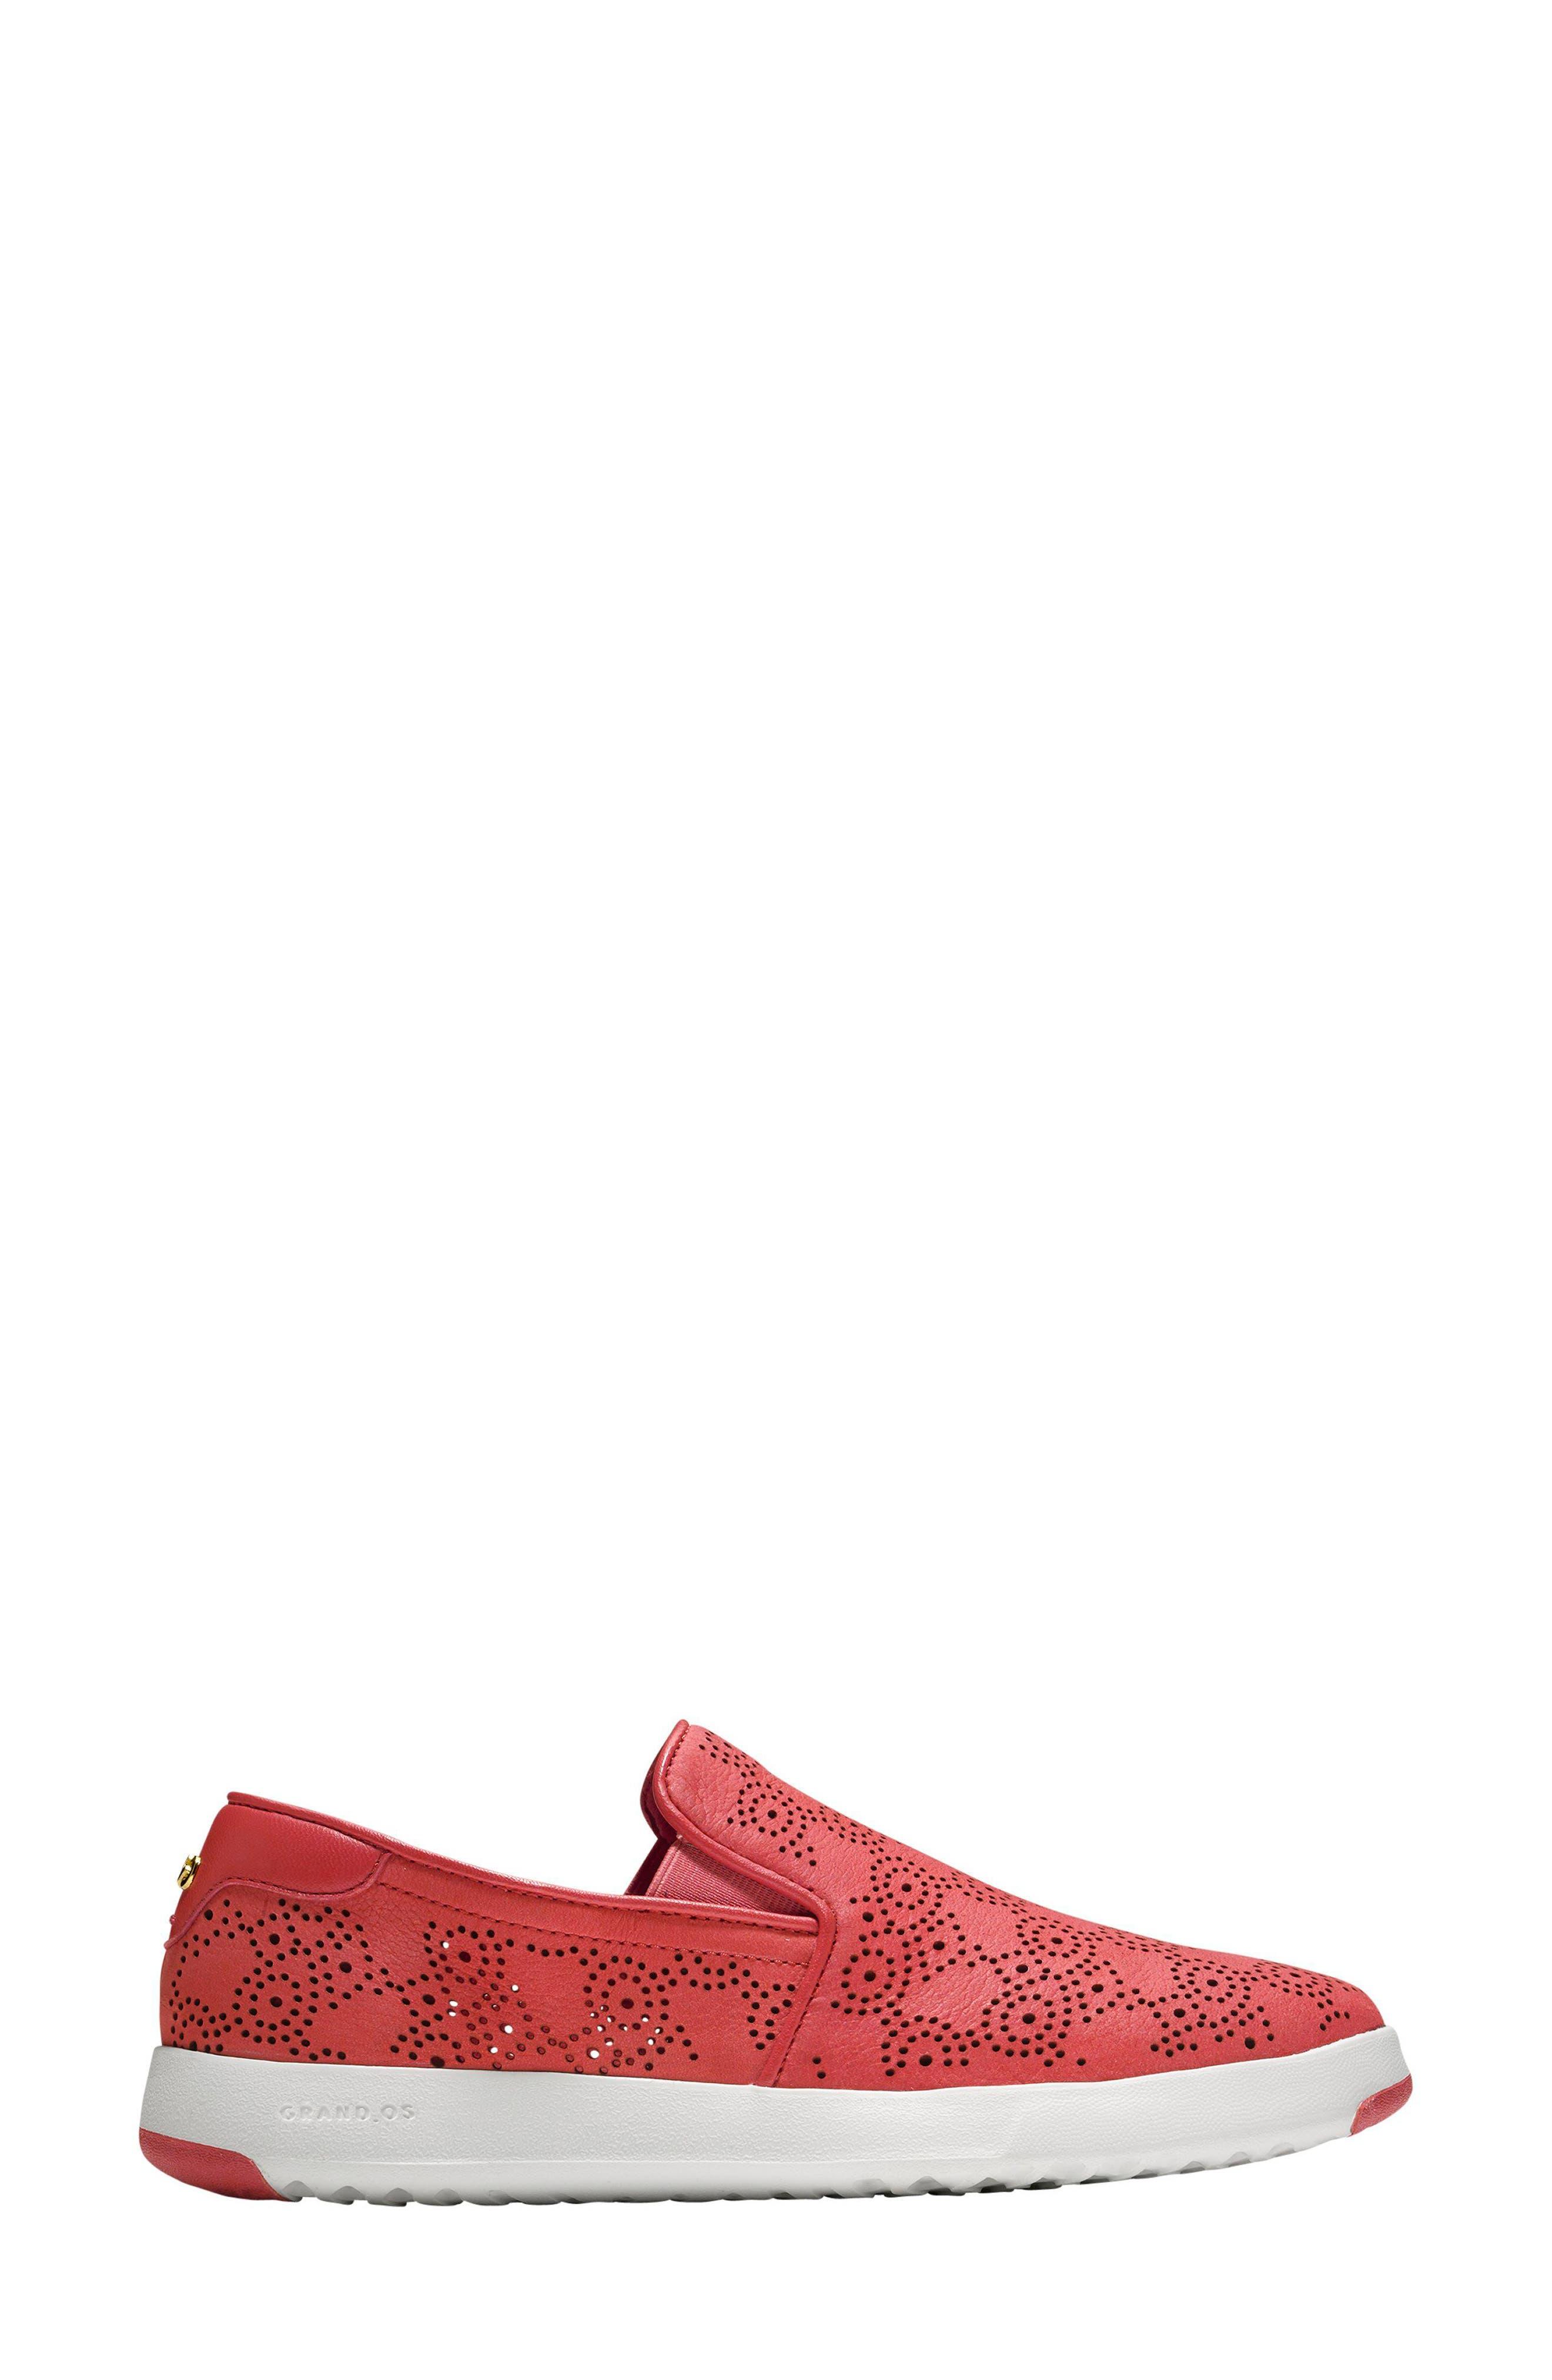 GrandPro Perforated Slip-On Sneaker,                             Alternate thumbnail 6, color,